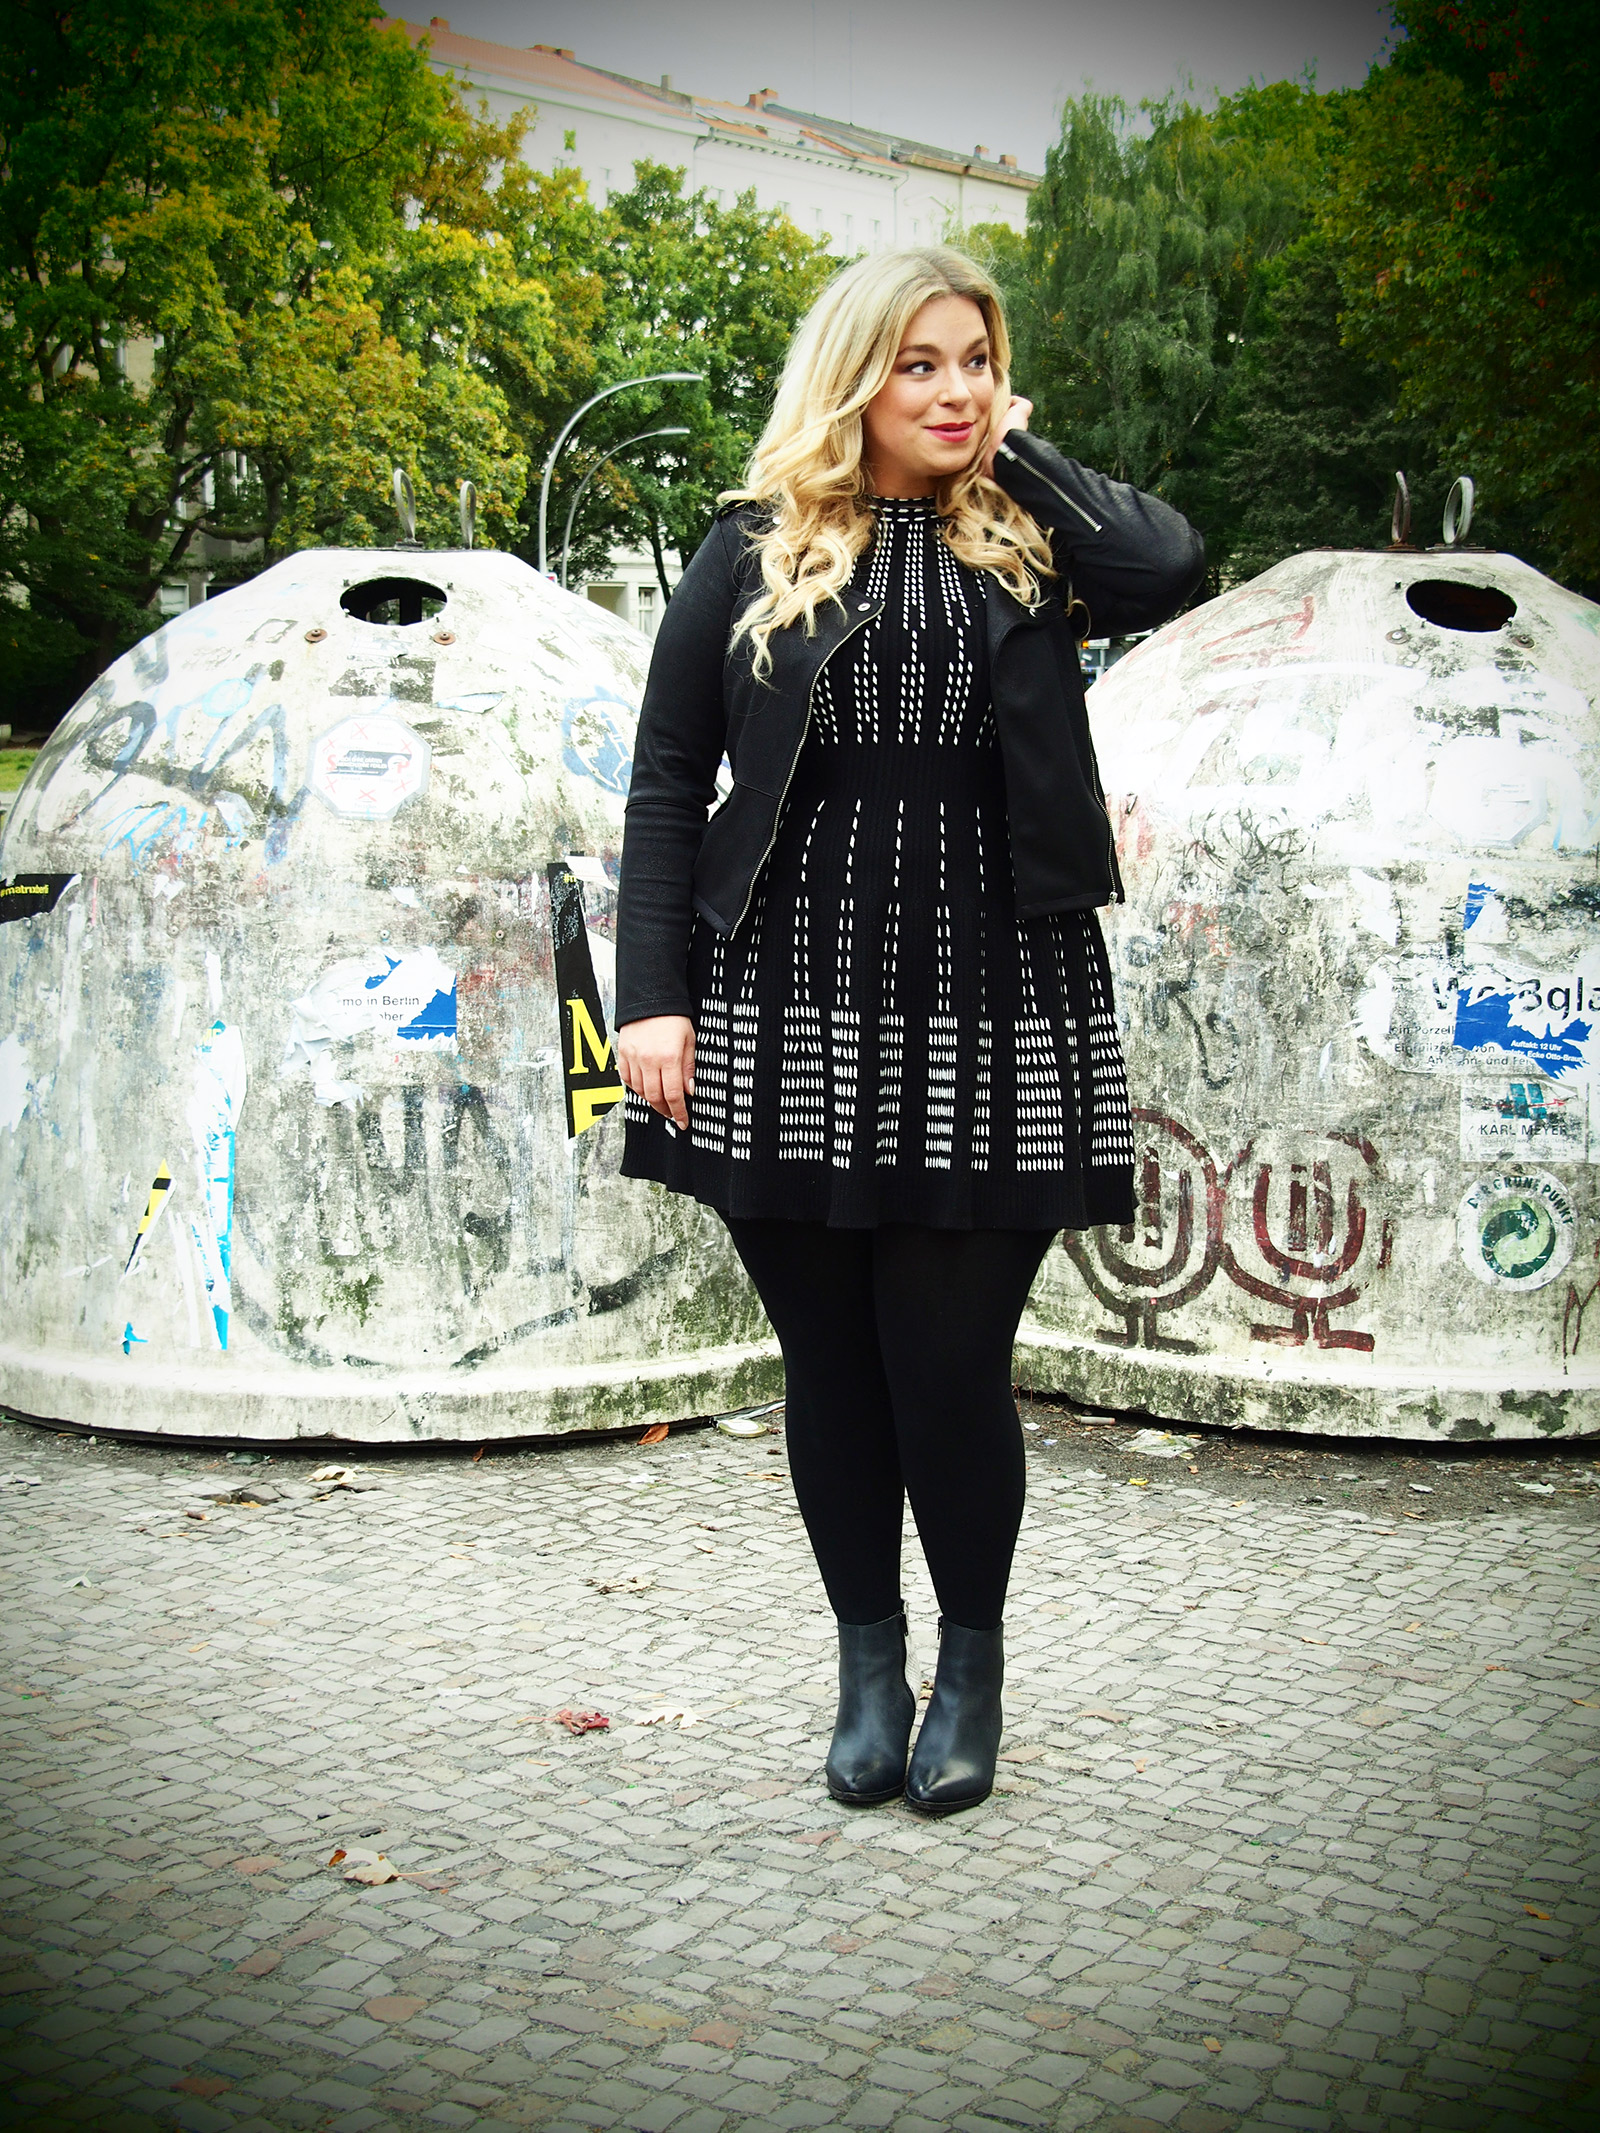 Strickleid-plussizeblogger-Megabambi-fashionblog-caterina-pogorzelski-curvymodel